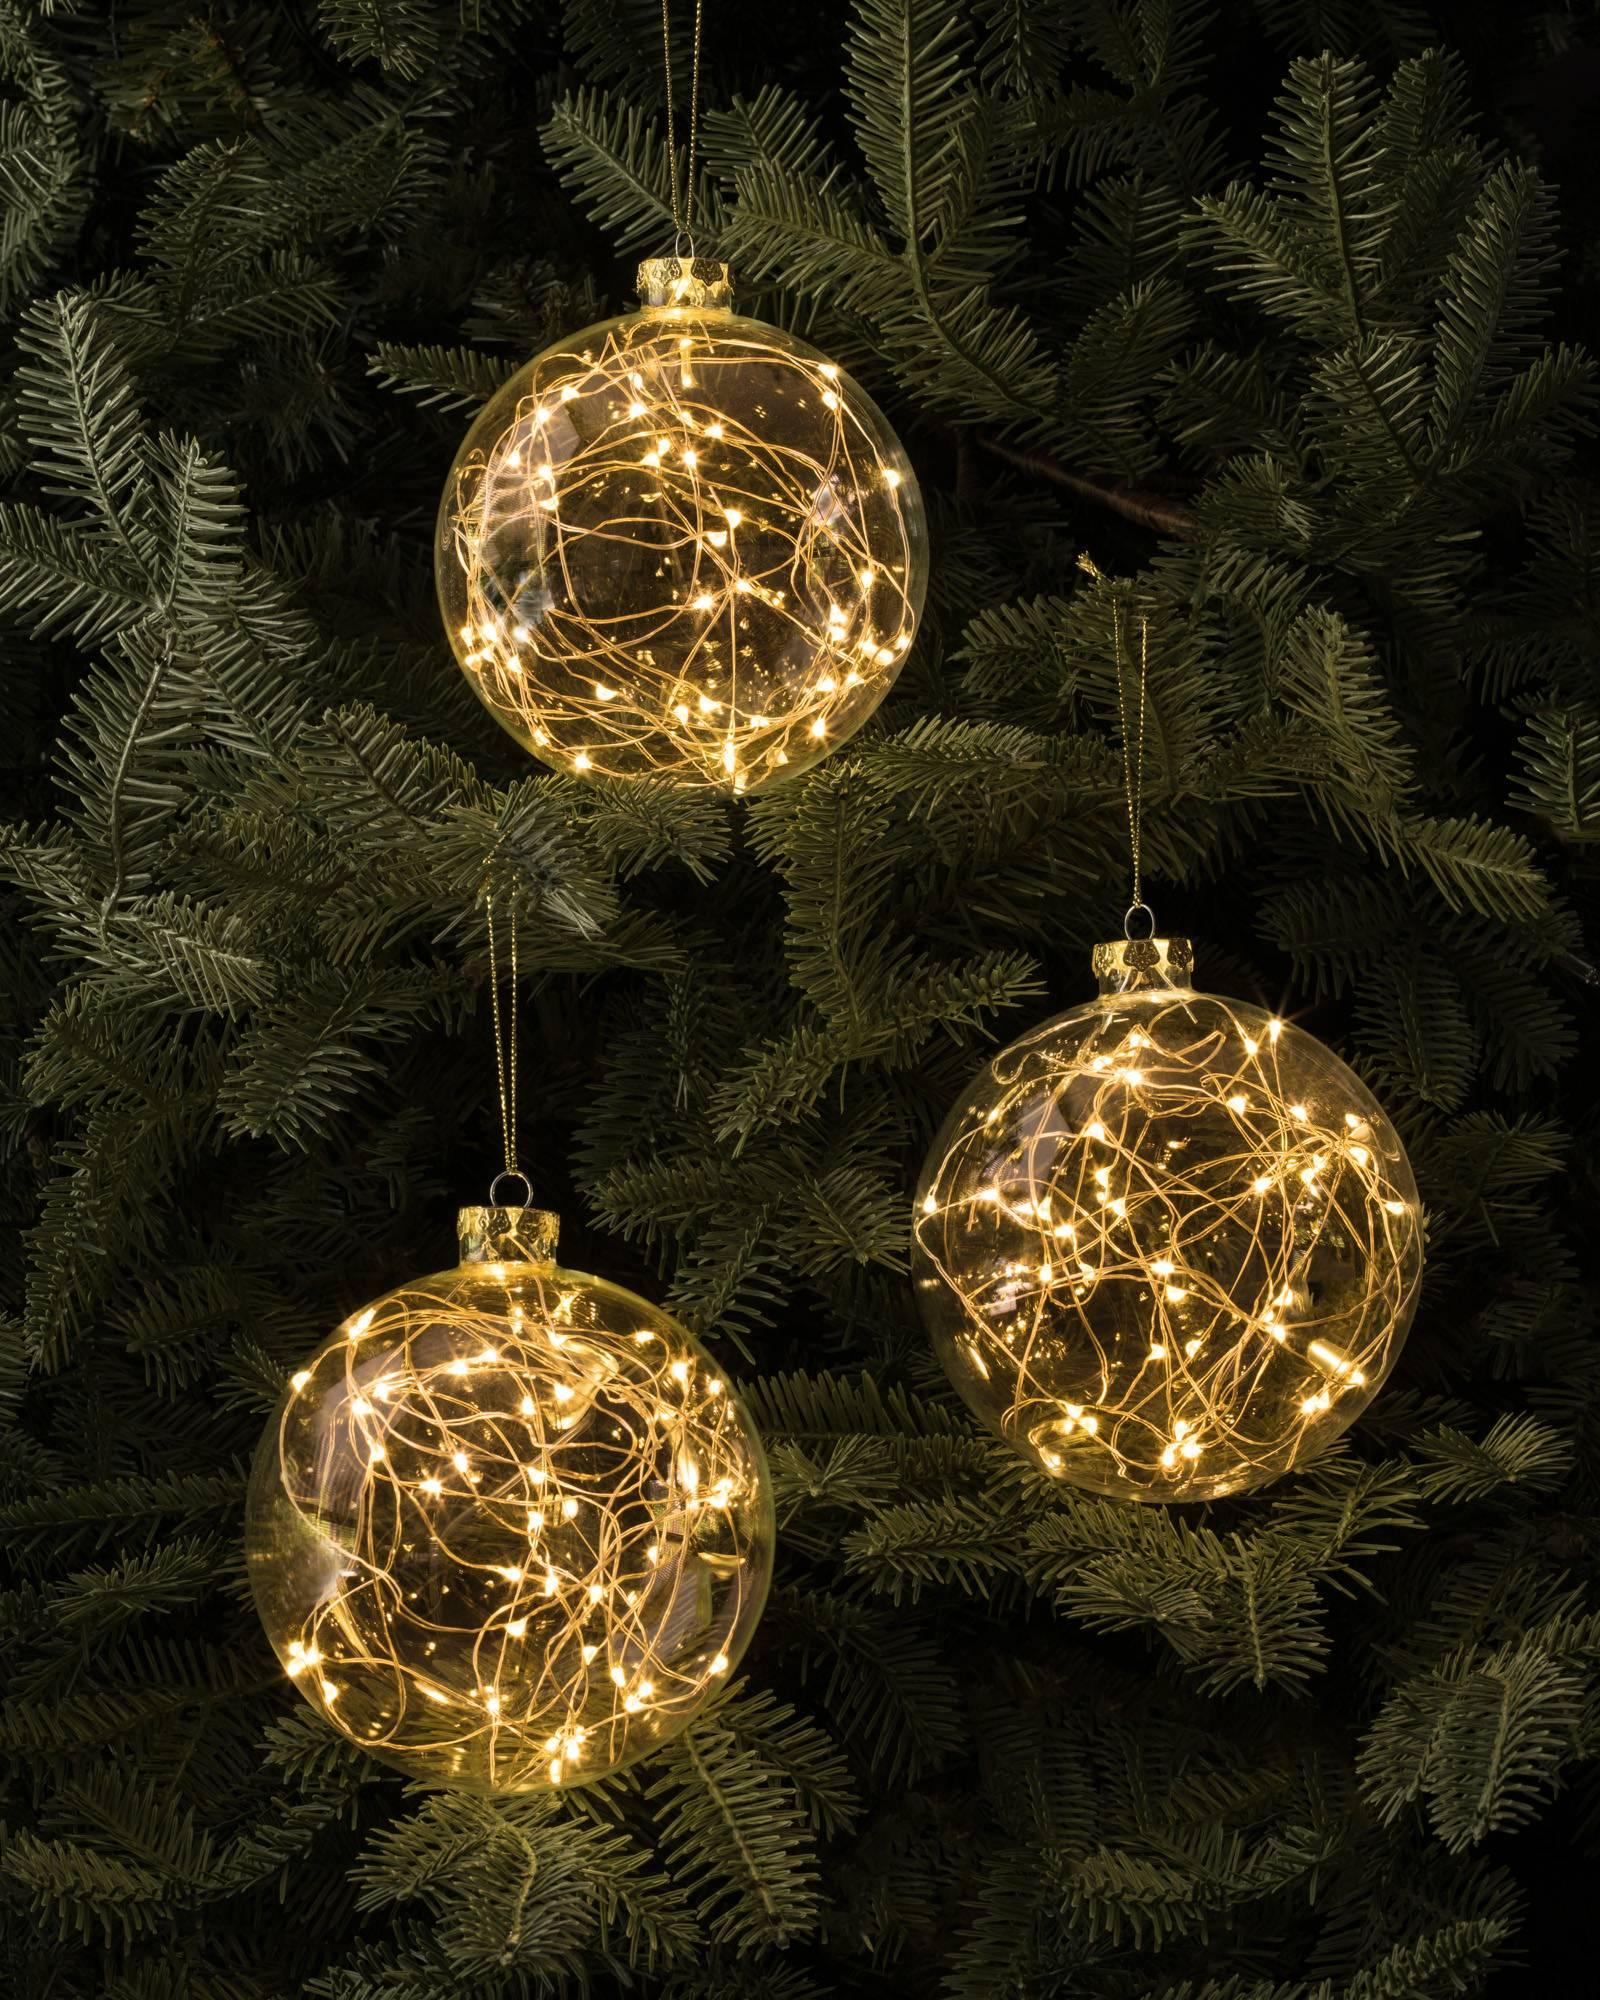 Fairy christmas ornaments - Led Fairy Light Ornaments Set Of 3 Main